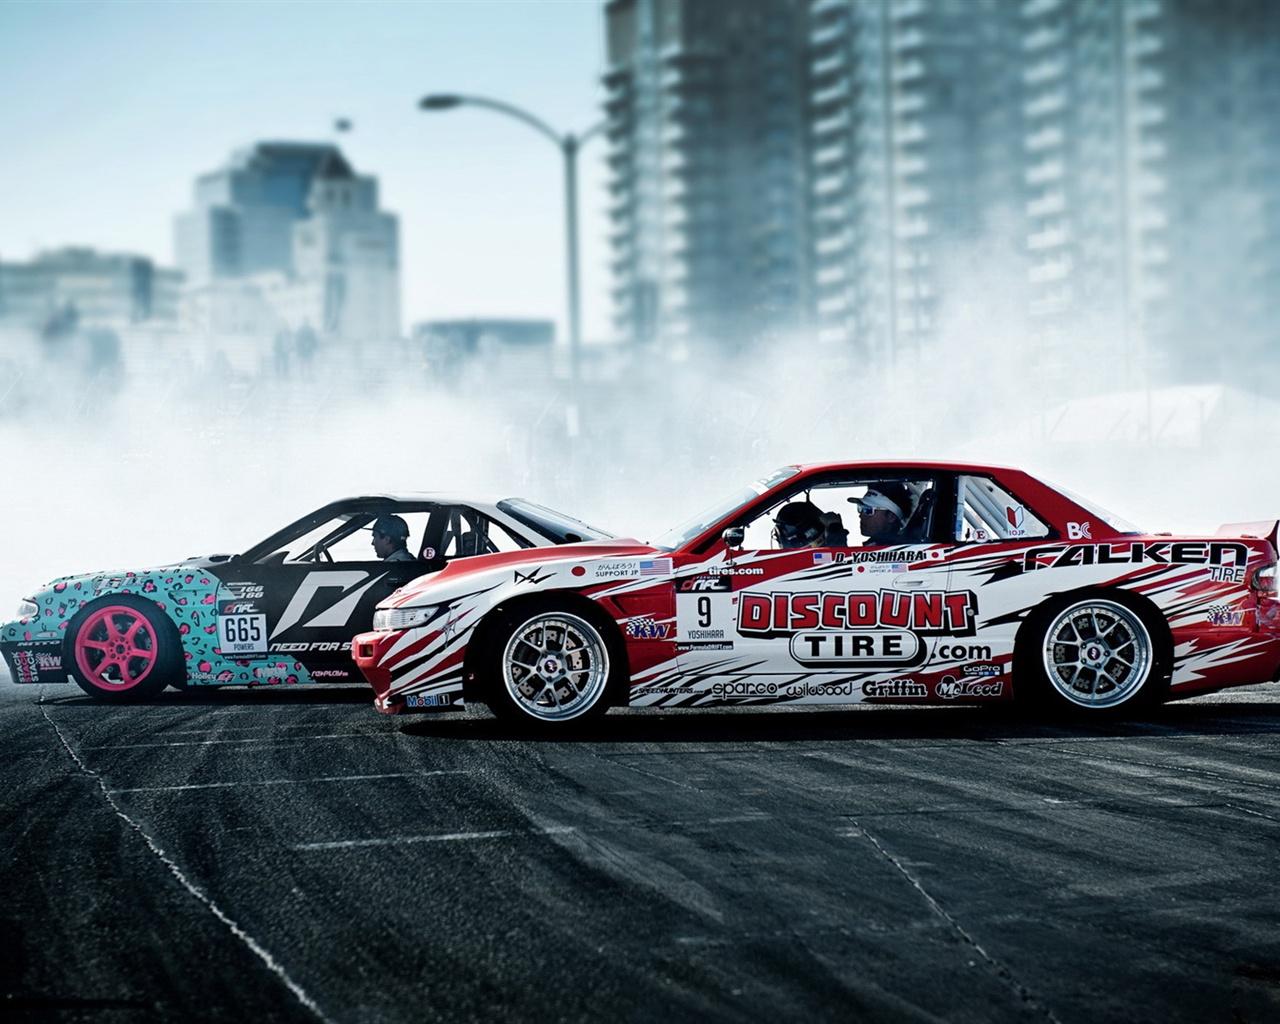 Smoke Drift Cars Sport 640x1136 Iphone 55s5cse Wallpaper